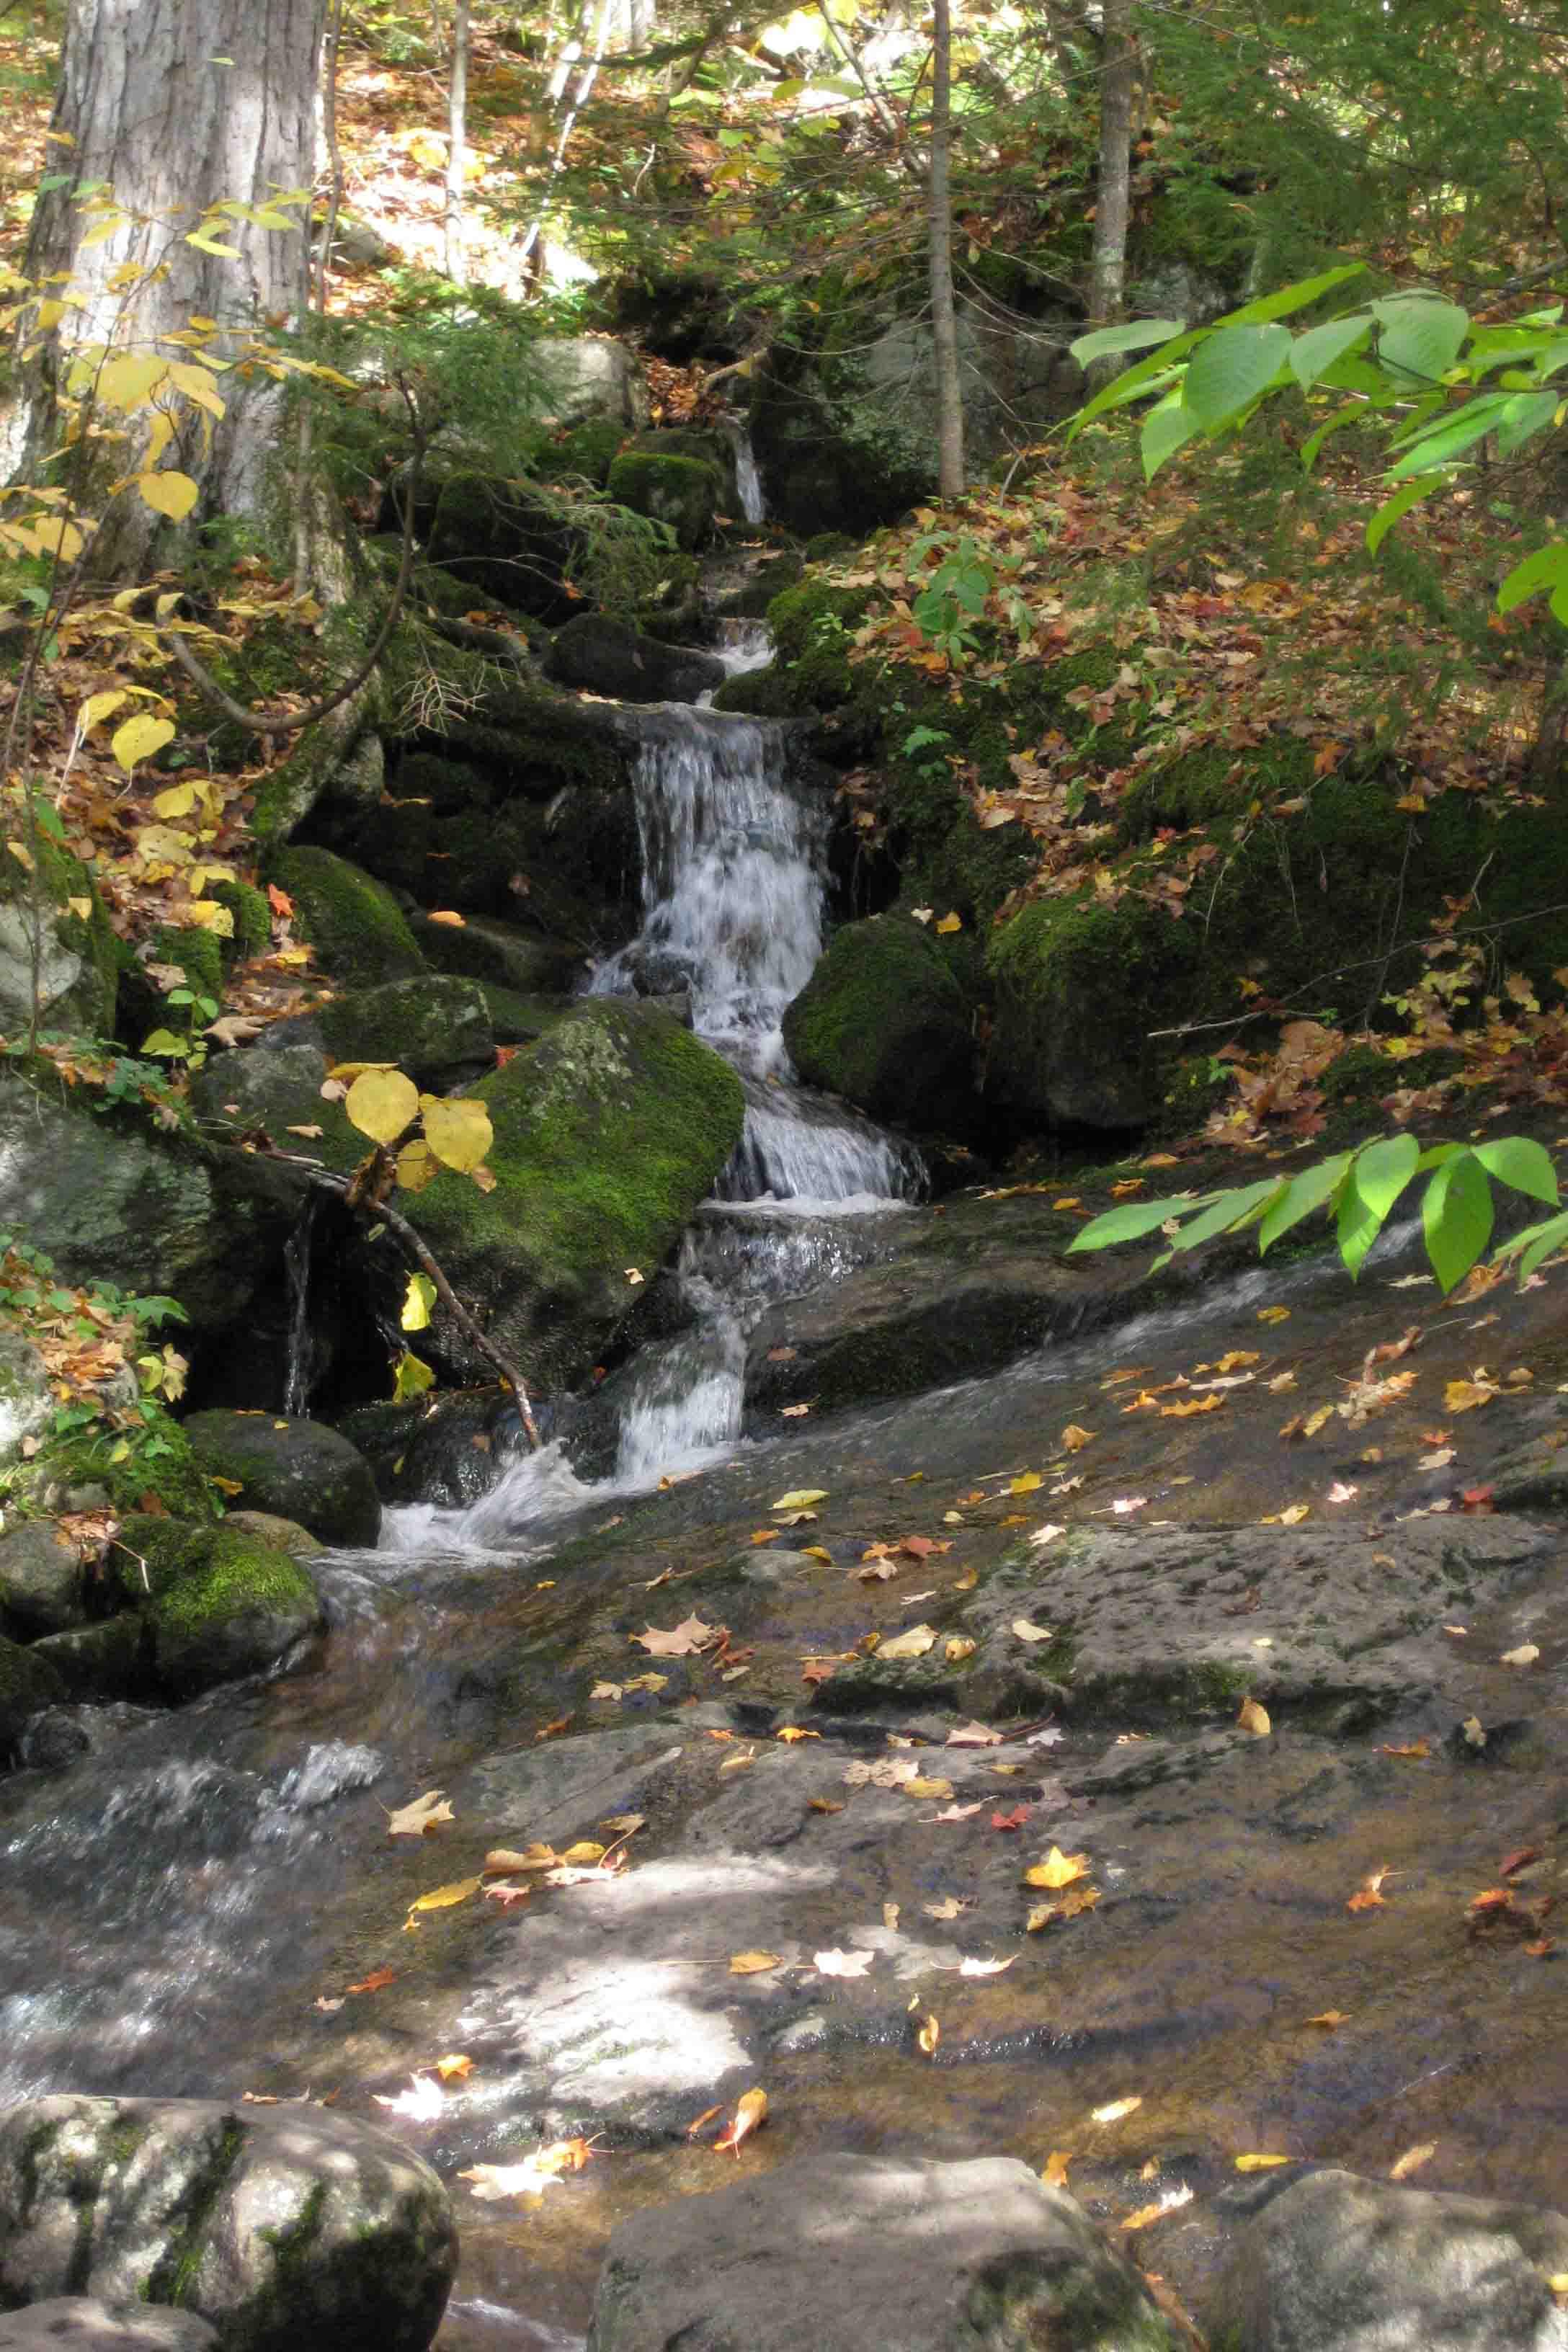 Cascade Mountain Trail in High Peaks Wilderness Area